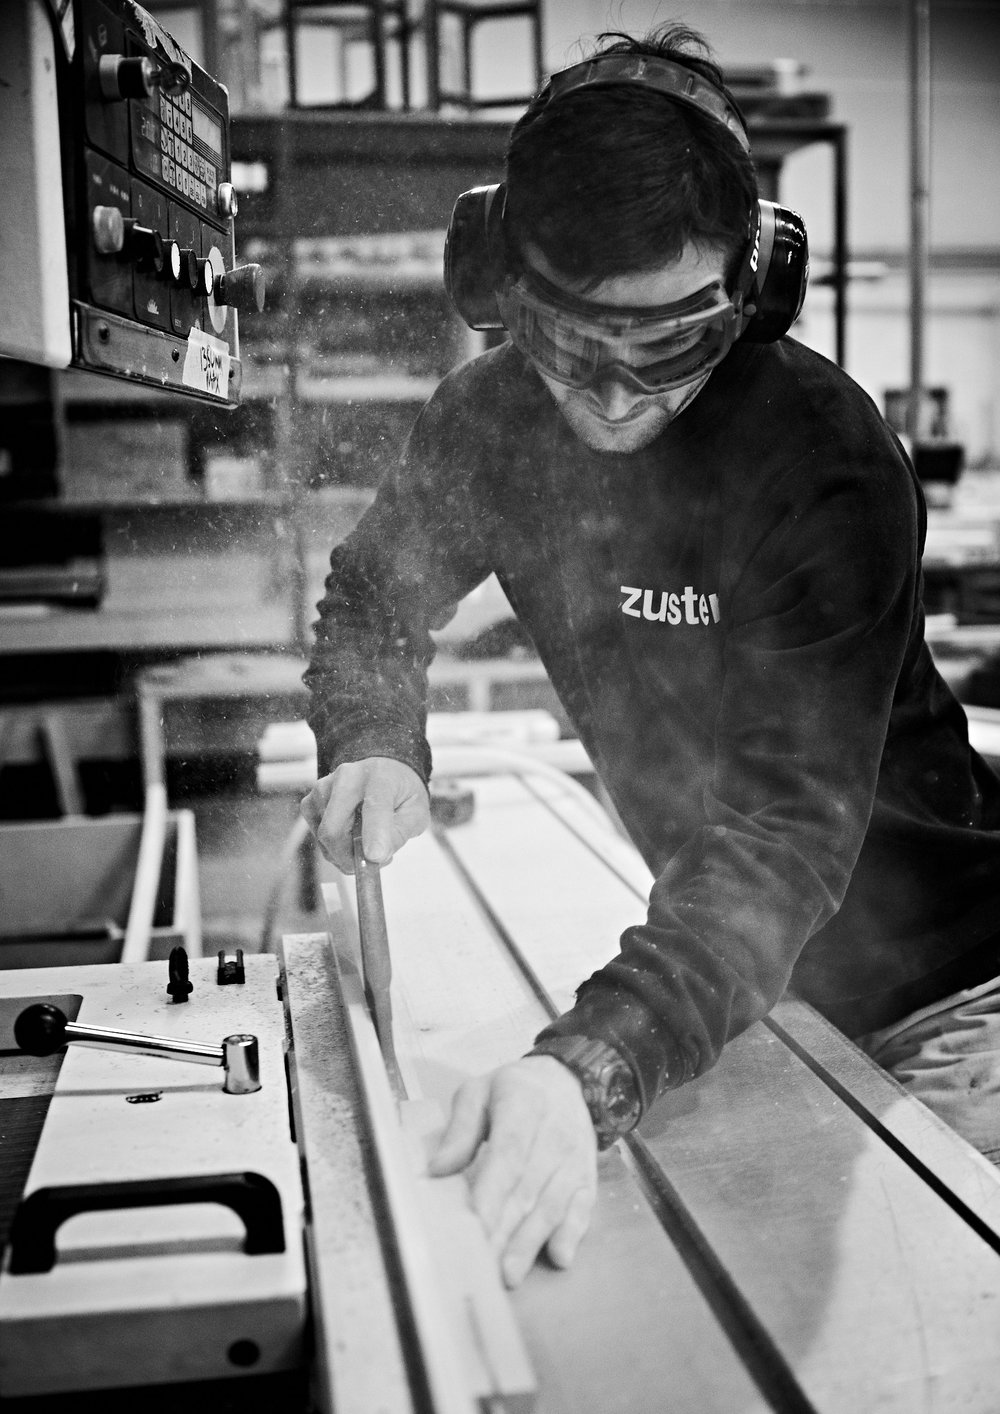 160728-Zuster-Workshop-022.jpg